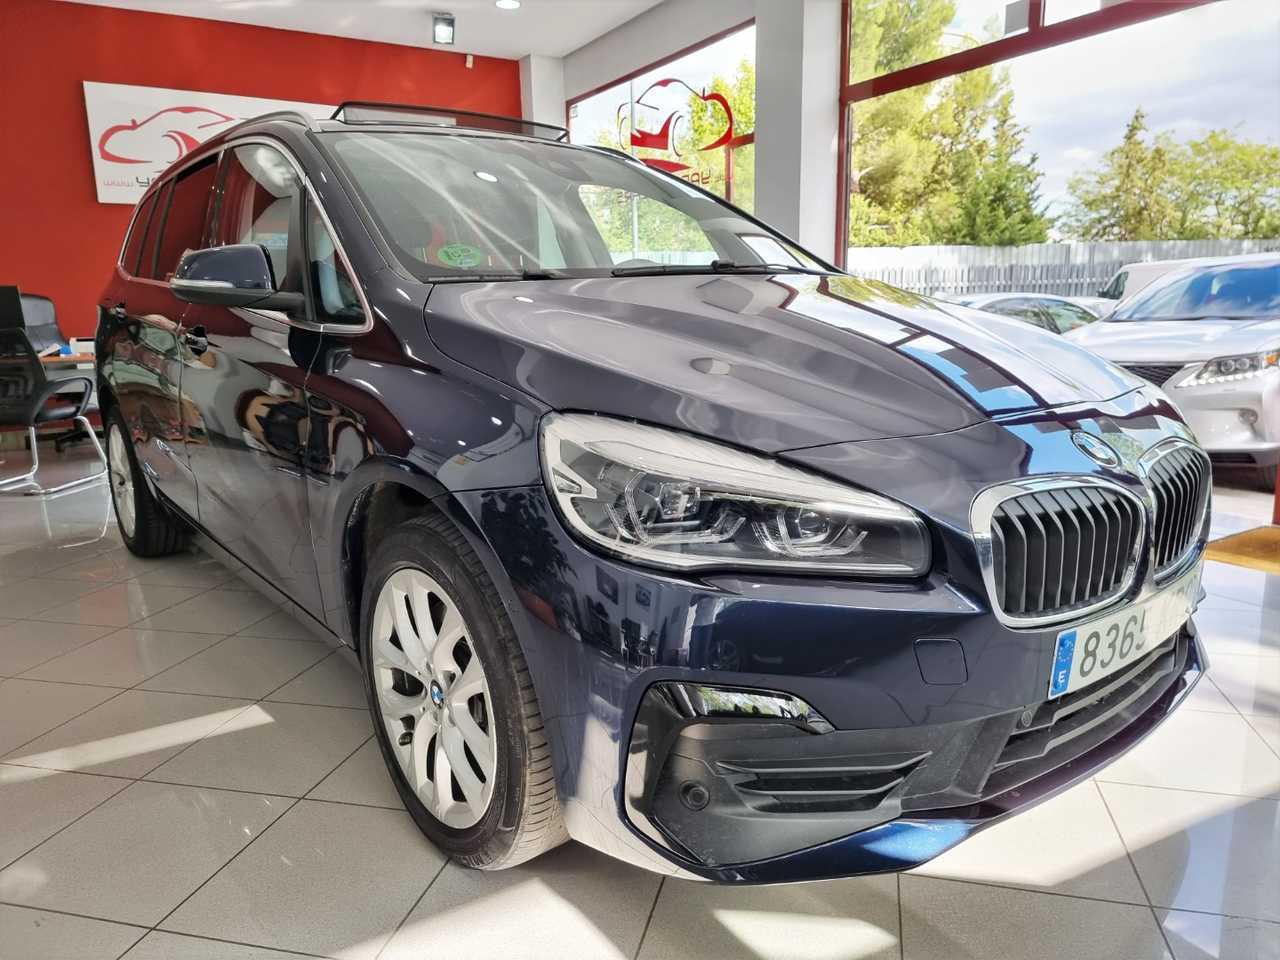 BMW Serie 2 Gran Tourer 218 dA 150 cv 7 Plazas Techo   - Foto 1